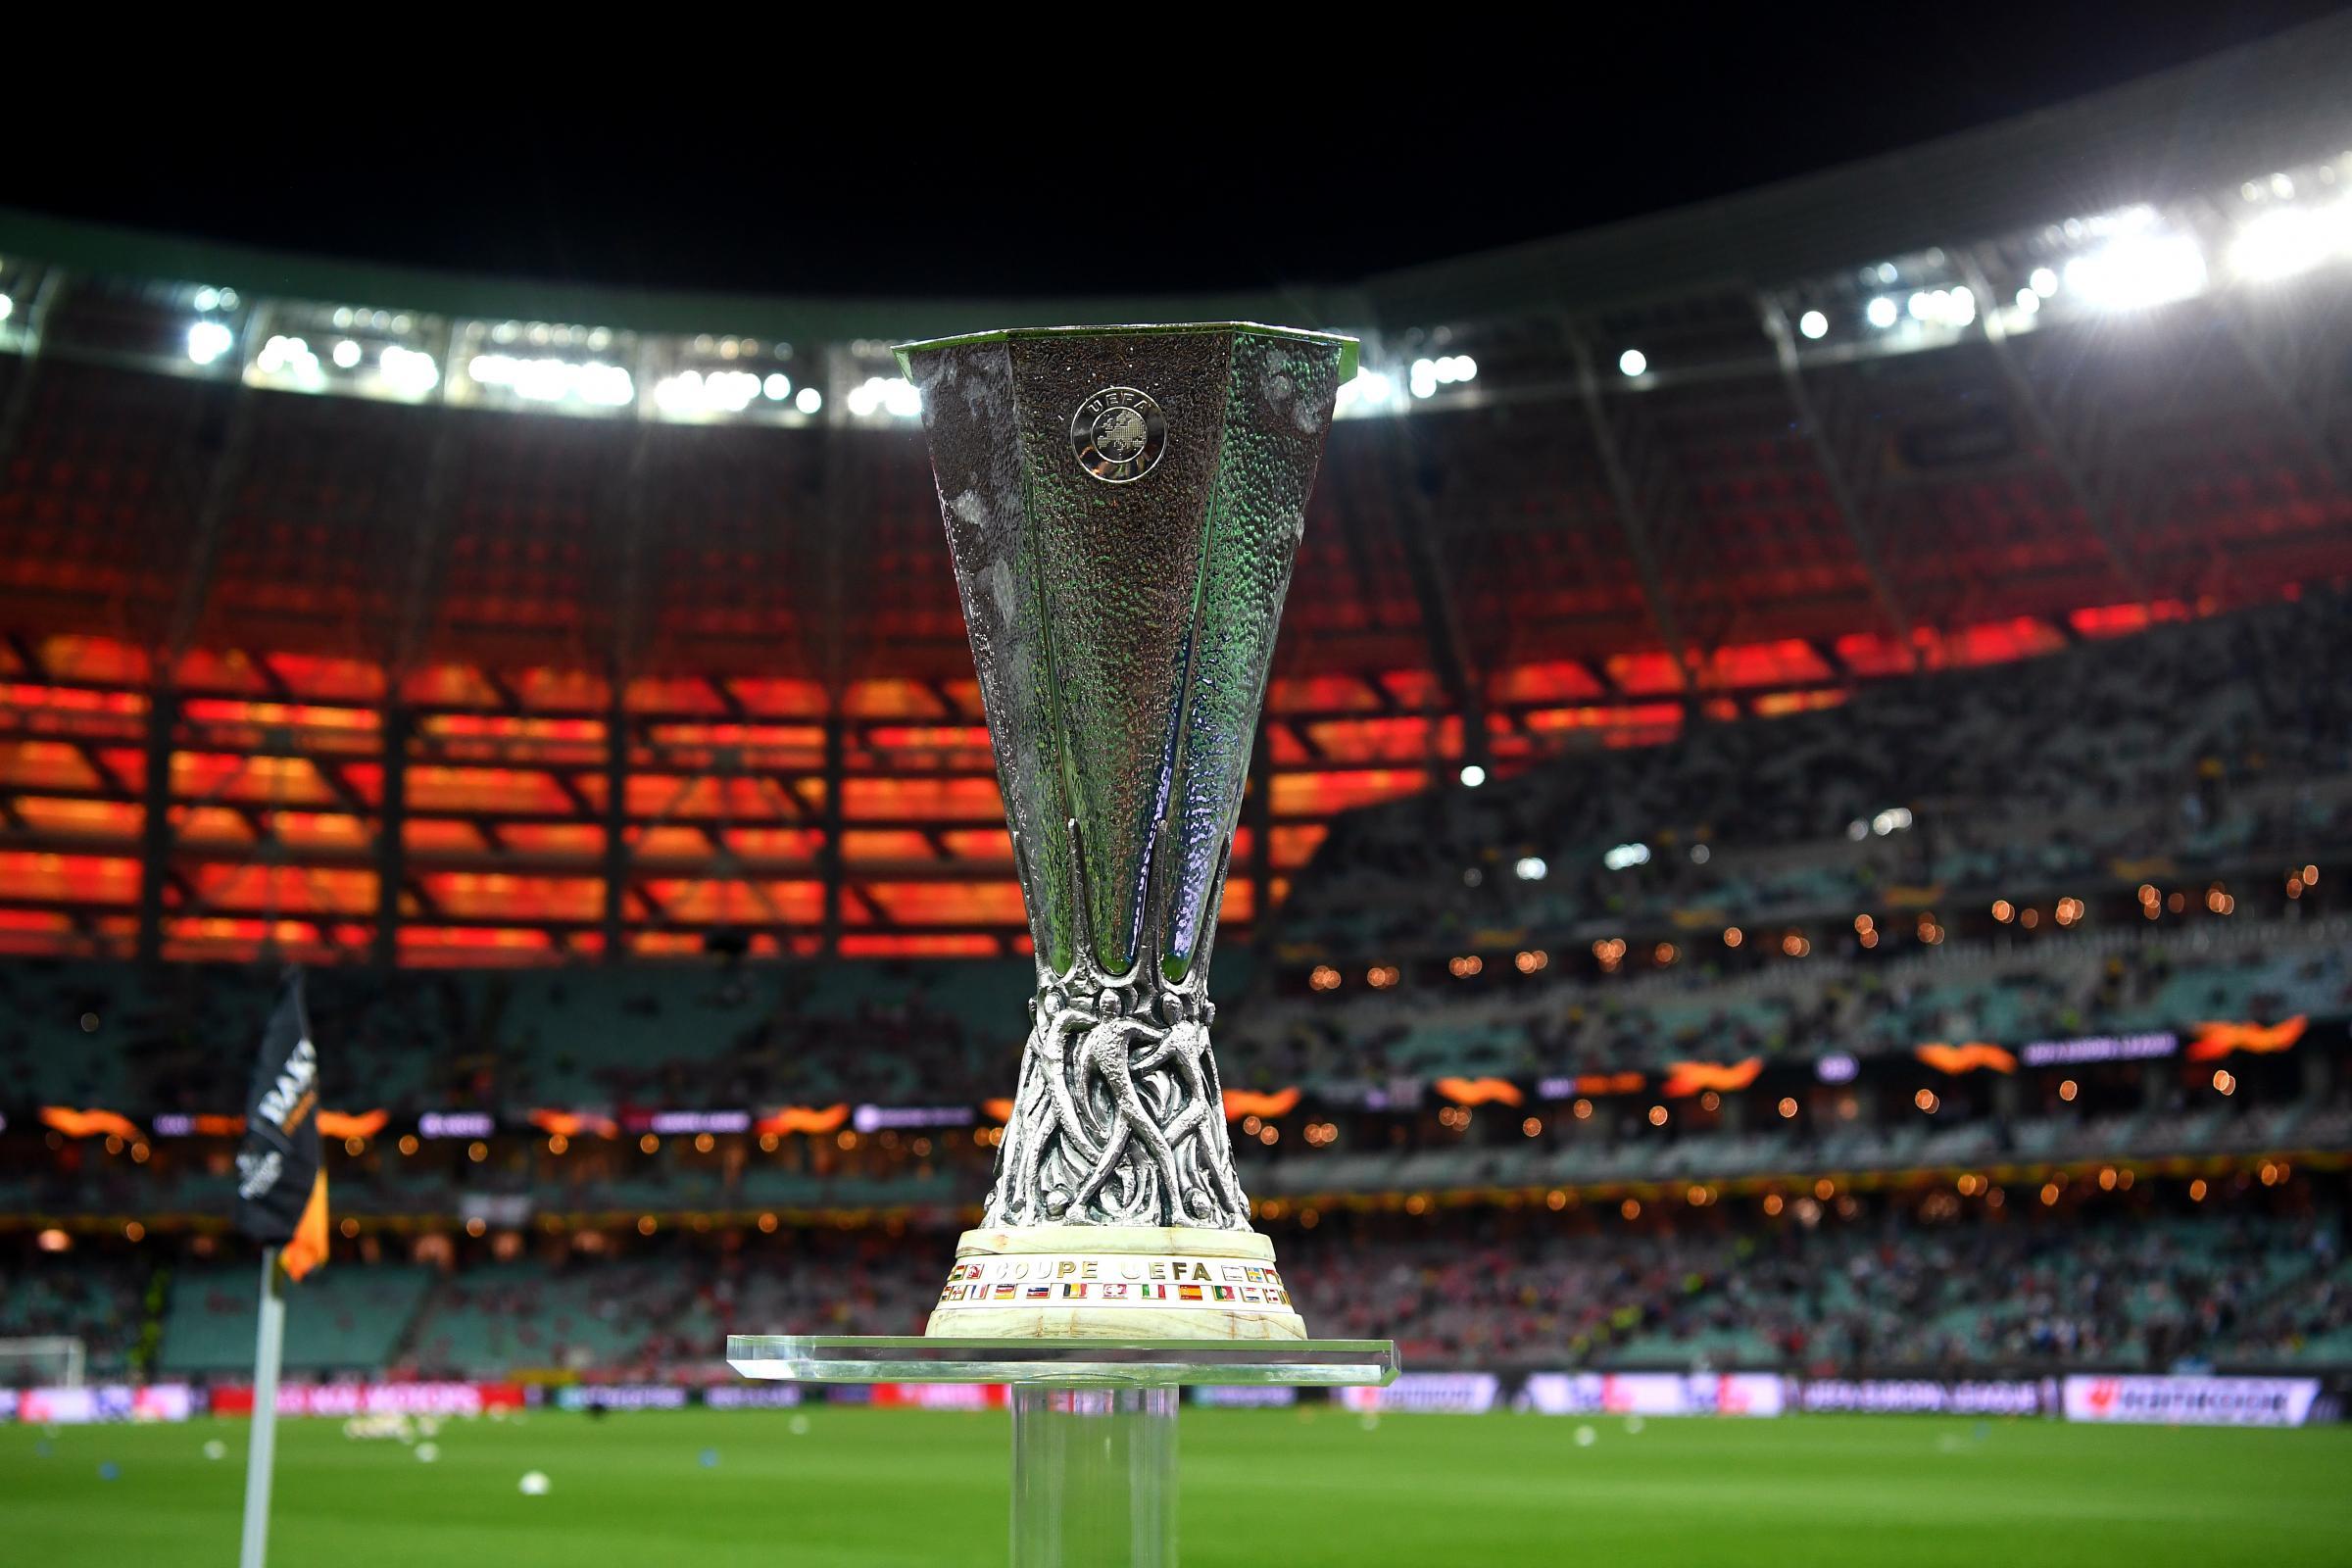 Europa League last 32 draw: When is it? Where can I watch it?